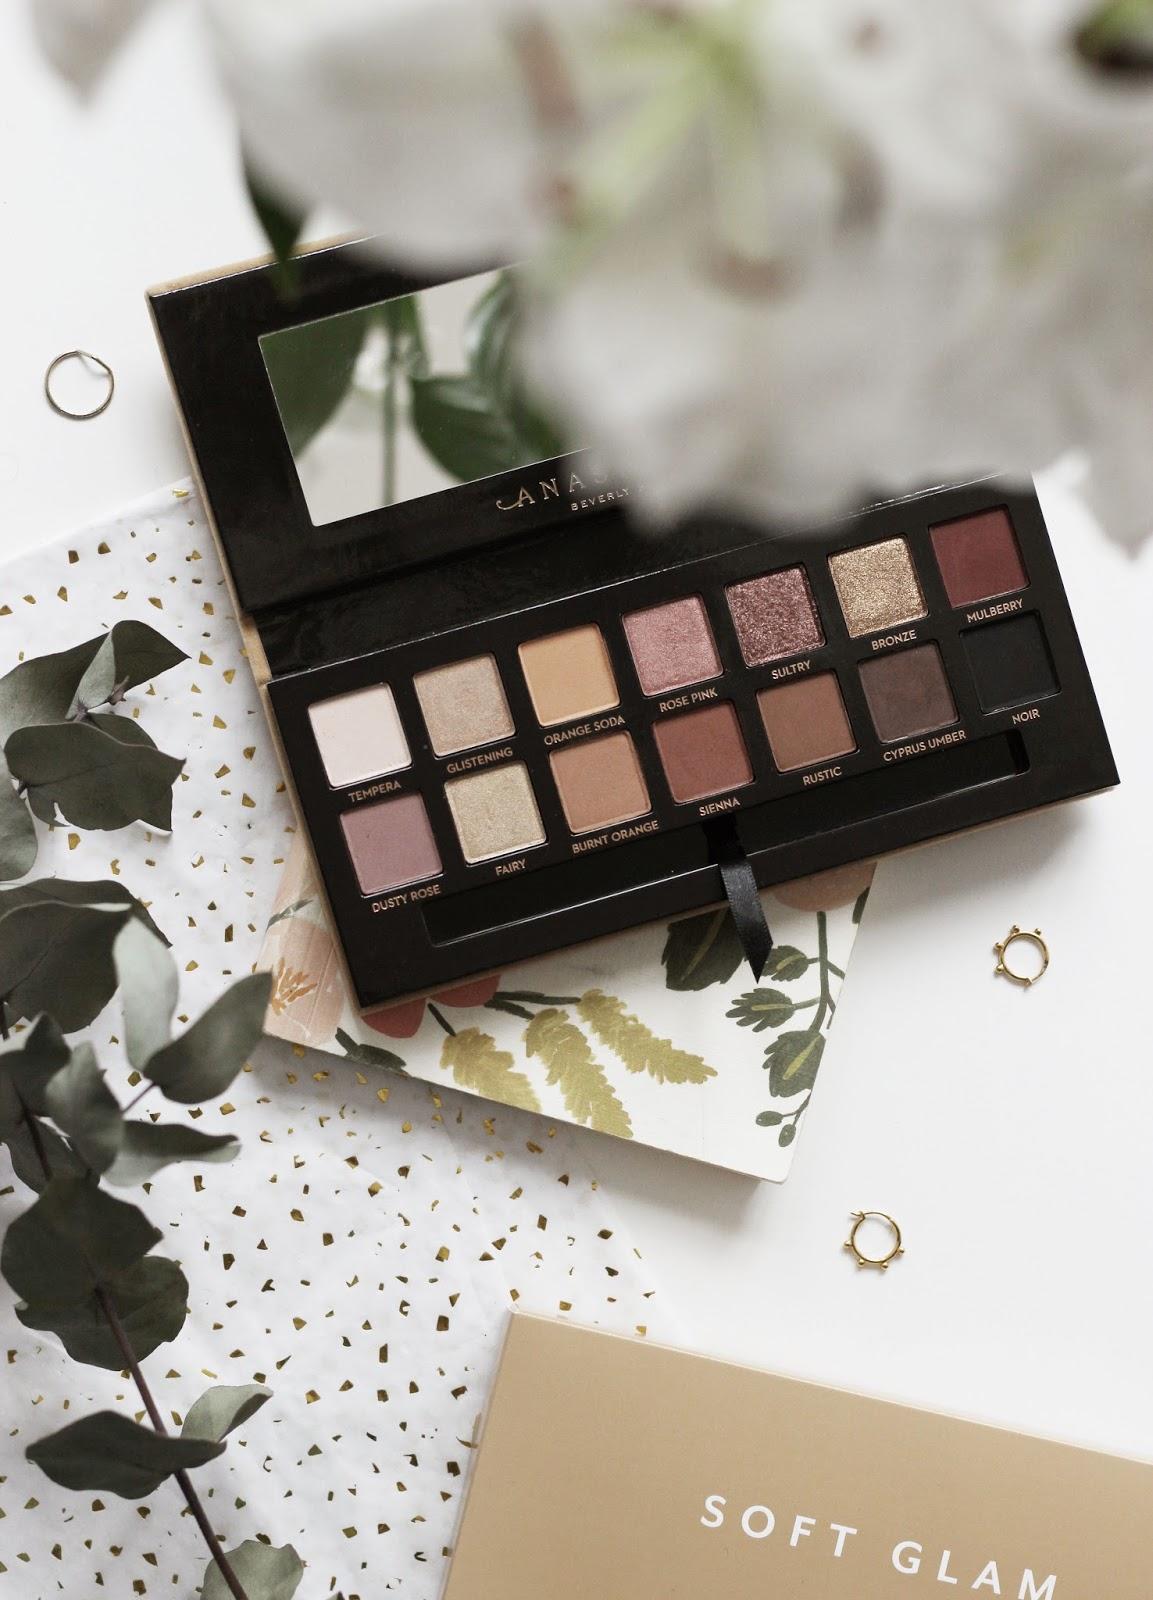 ABH Anastasia Beverly Hills Soft Glam Eyeshadow Palette First Impressions